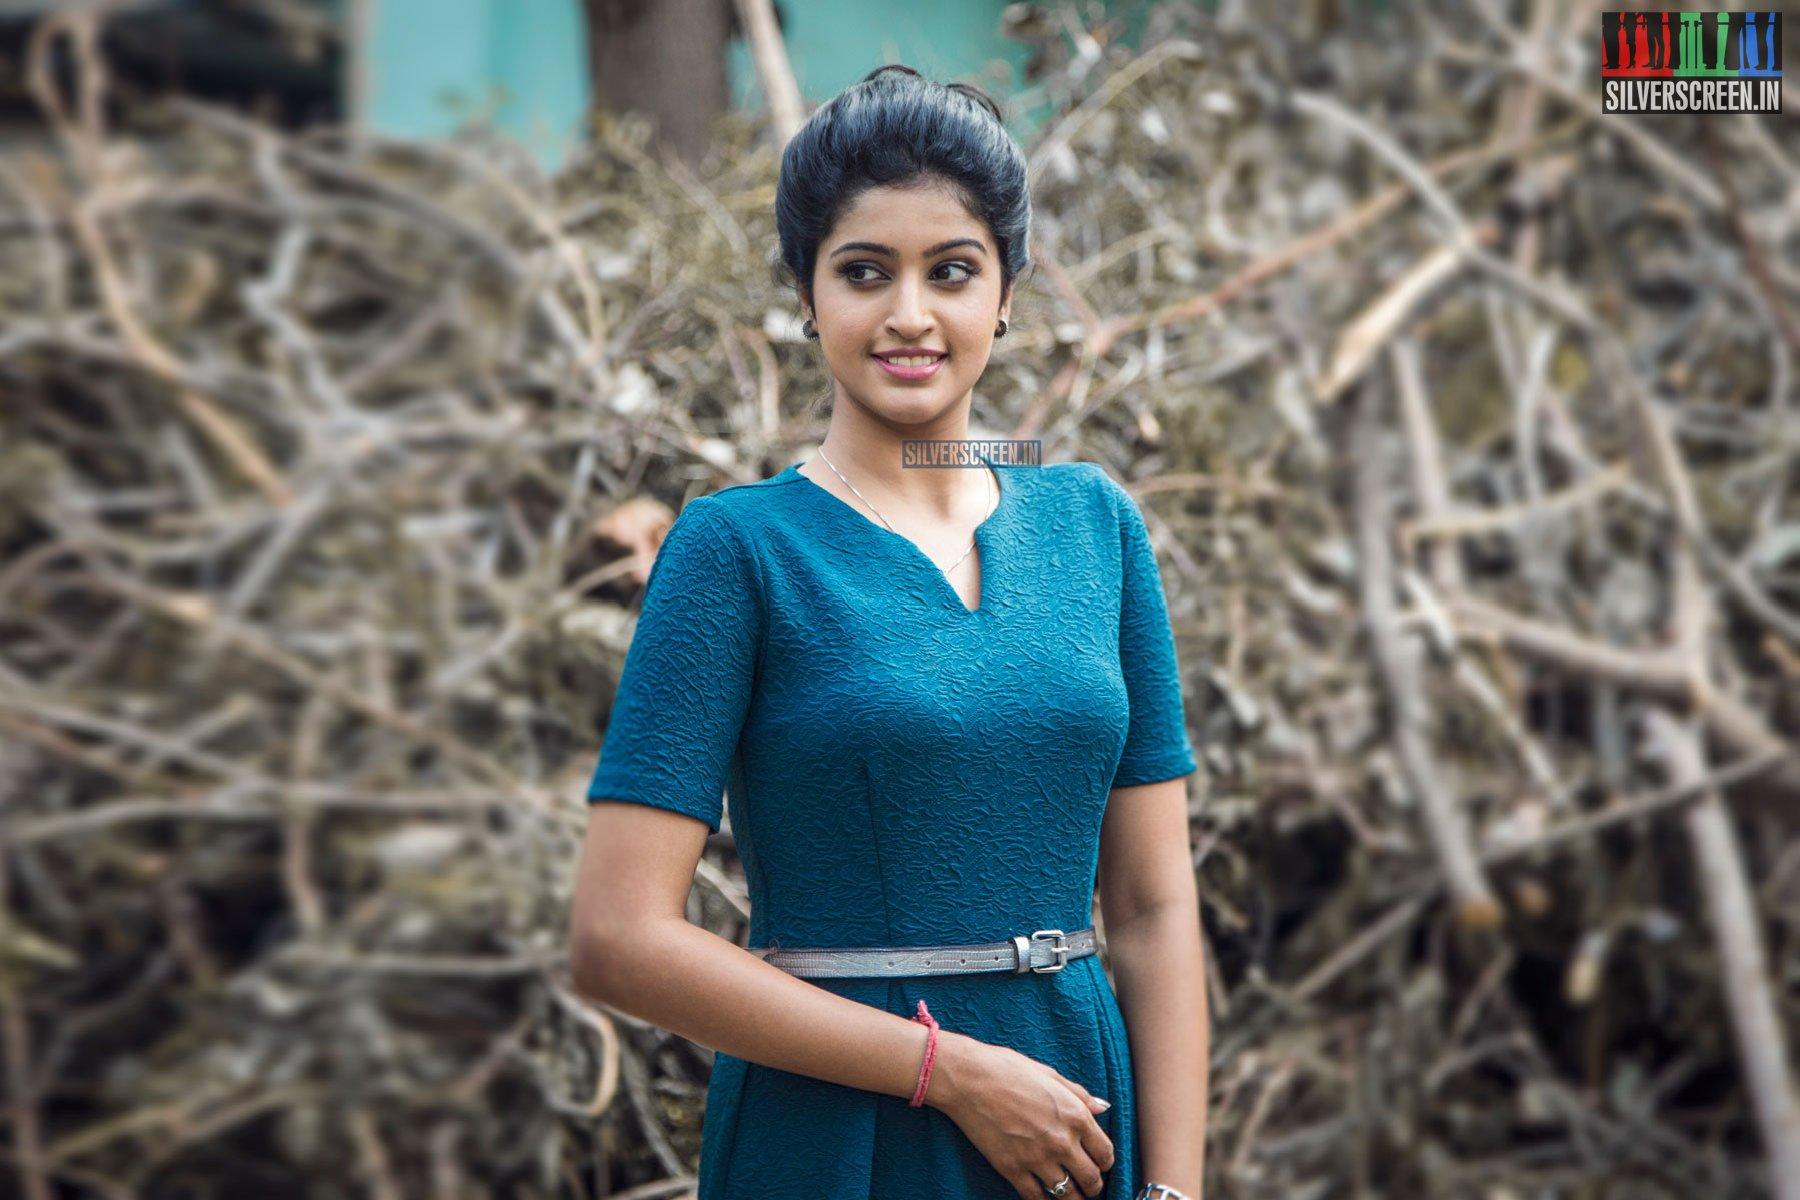 Tournament malayalam movie heroine